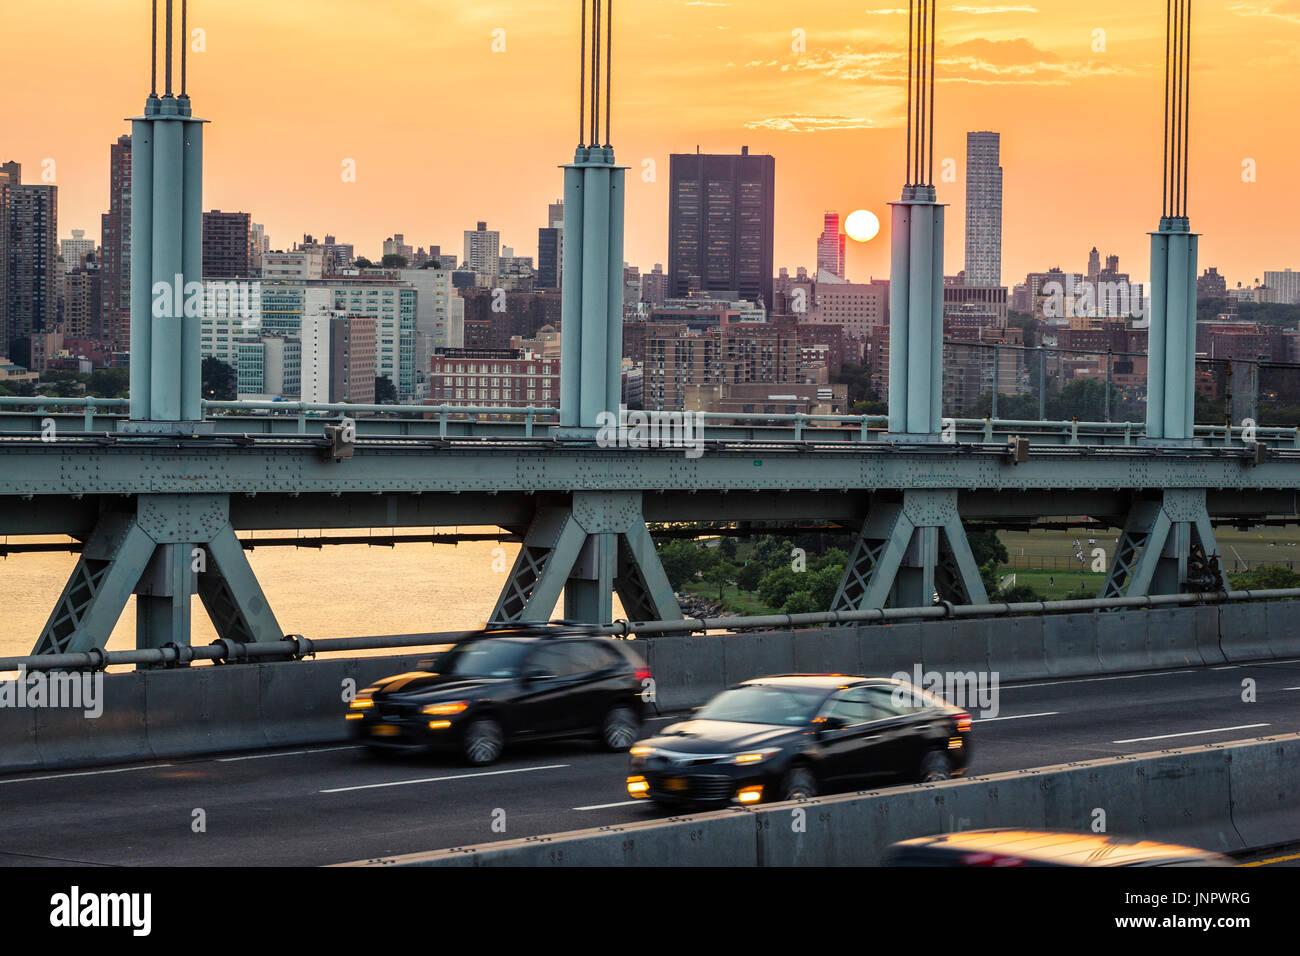 Traffic on Triborough Bridge, the Robert F. Kennedy Bridge in New York City at sunset - Stock Image